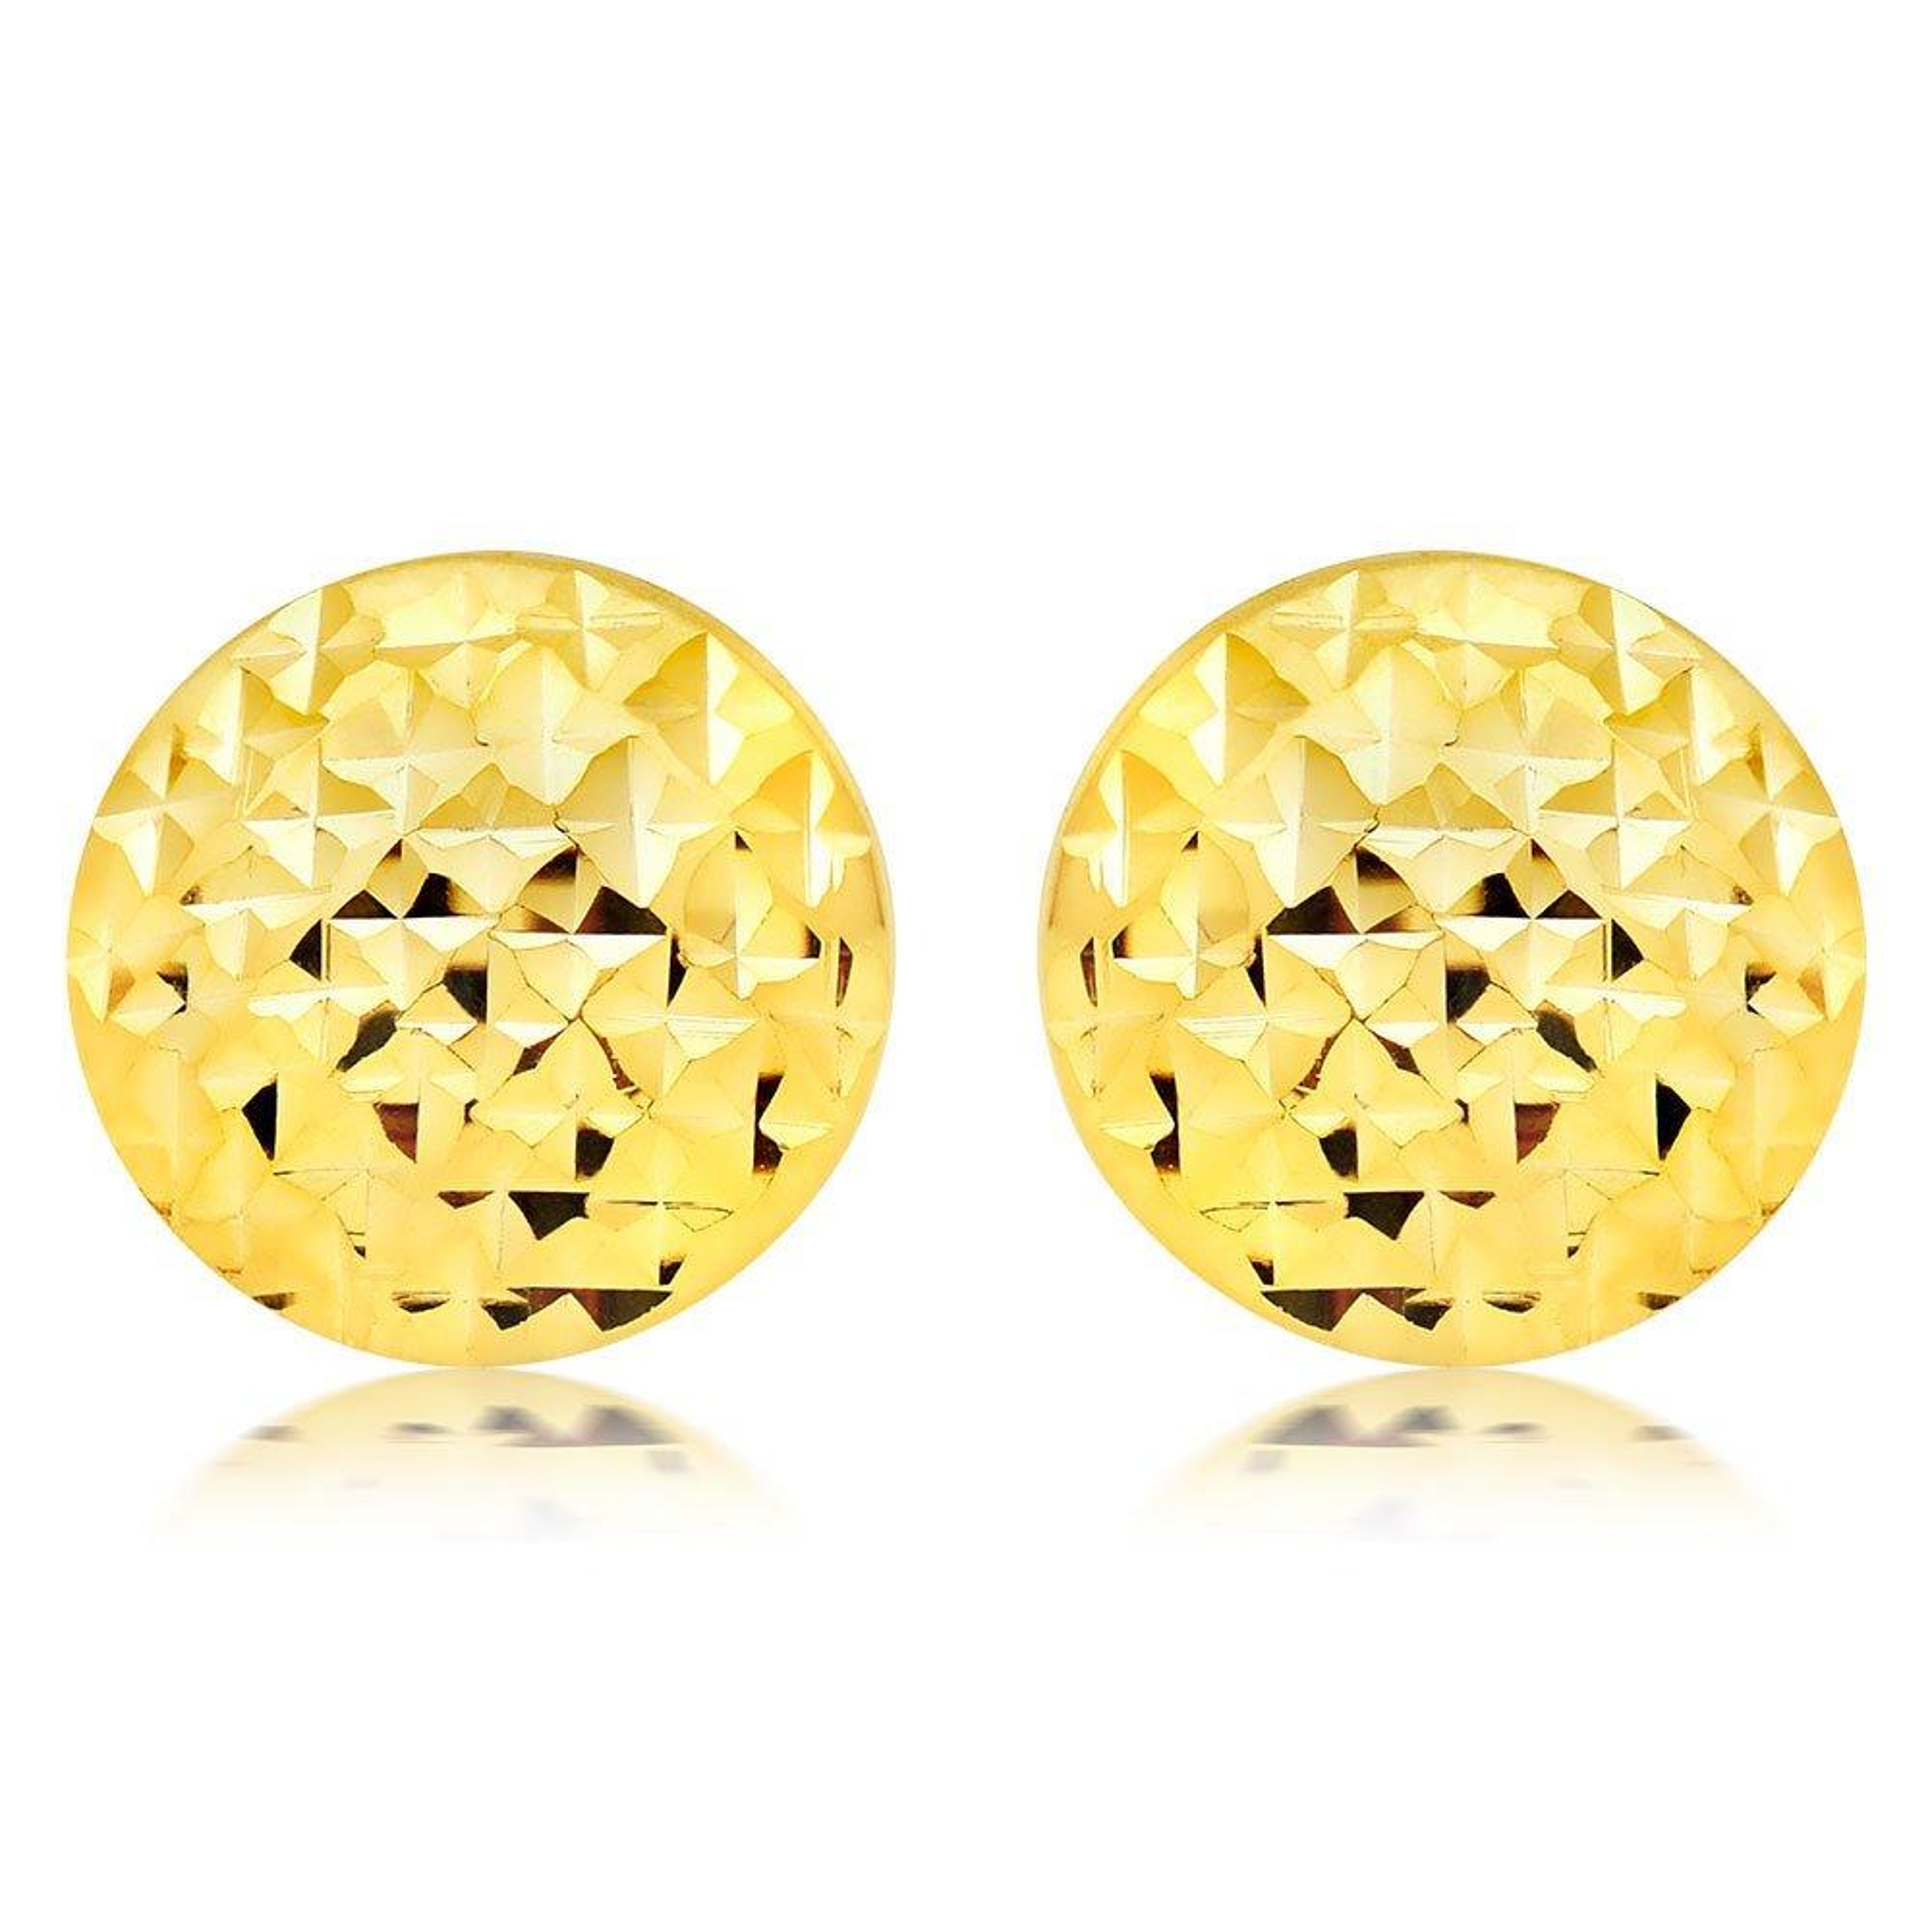 9ct Gold Circle Stud Earrings